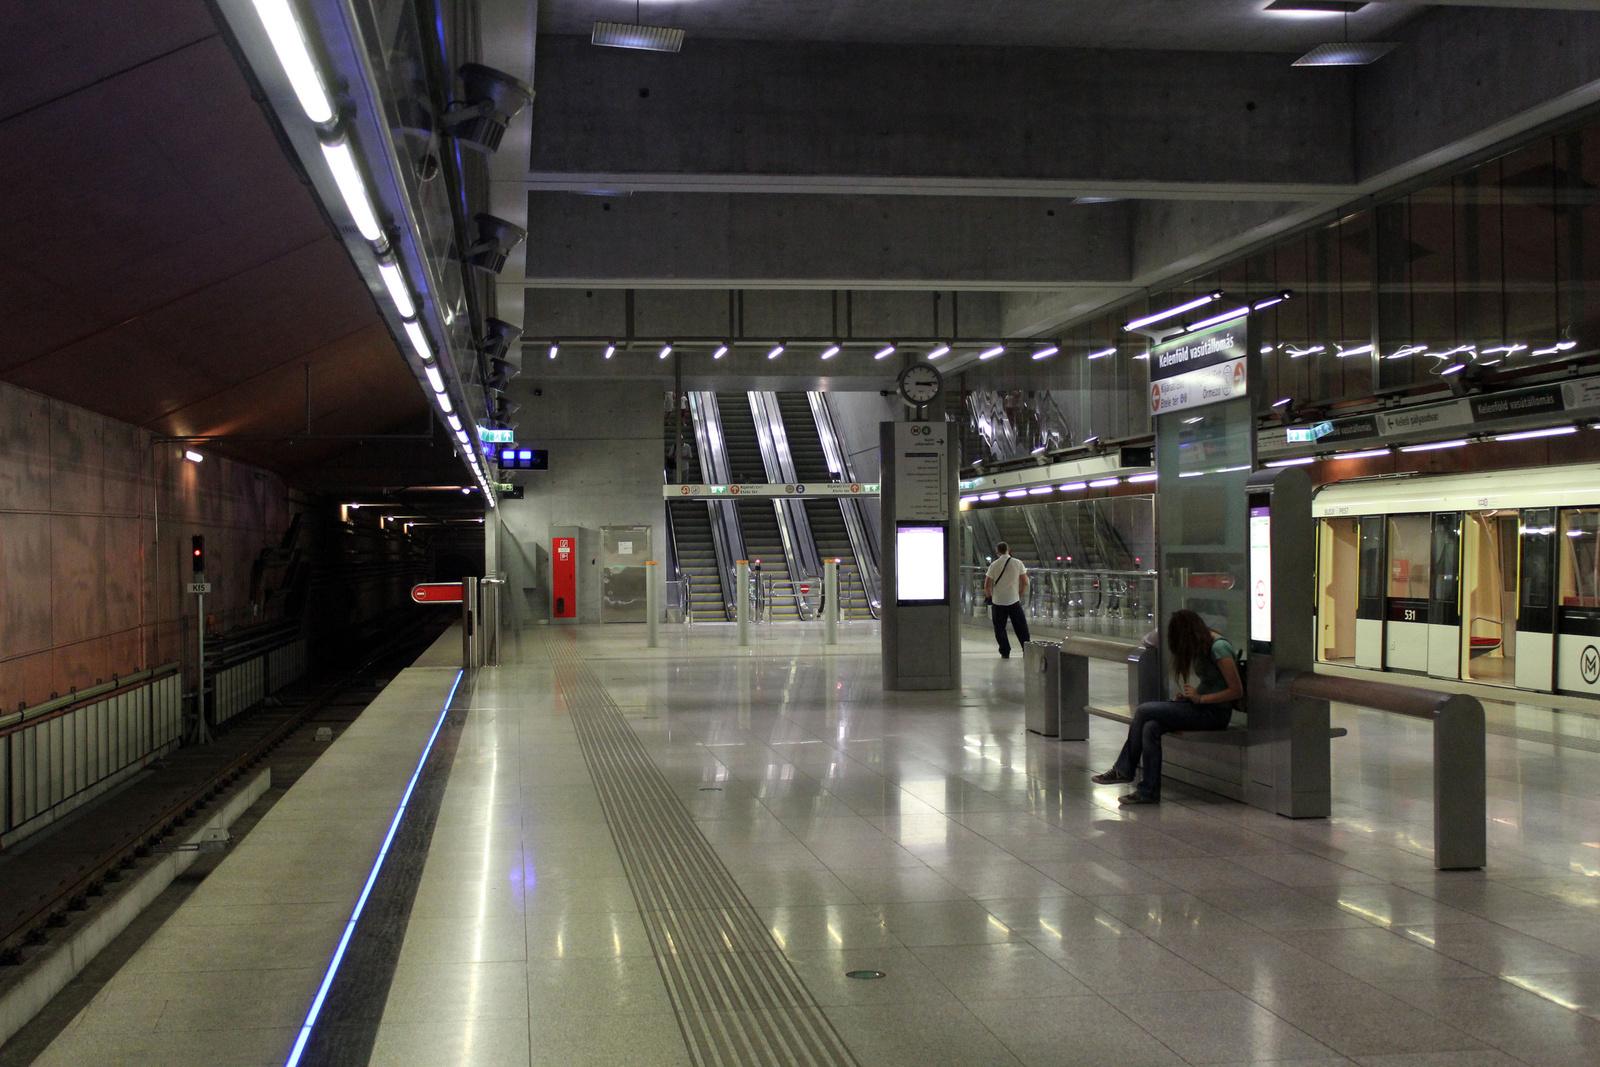 Metro4-KelenfoldVasutallomas-20150817-02